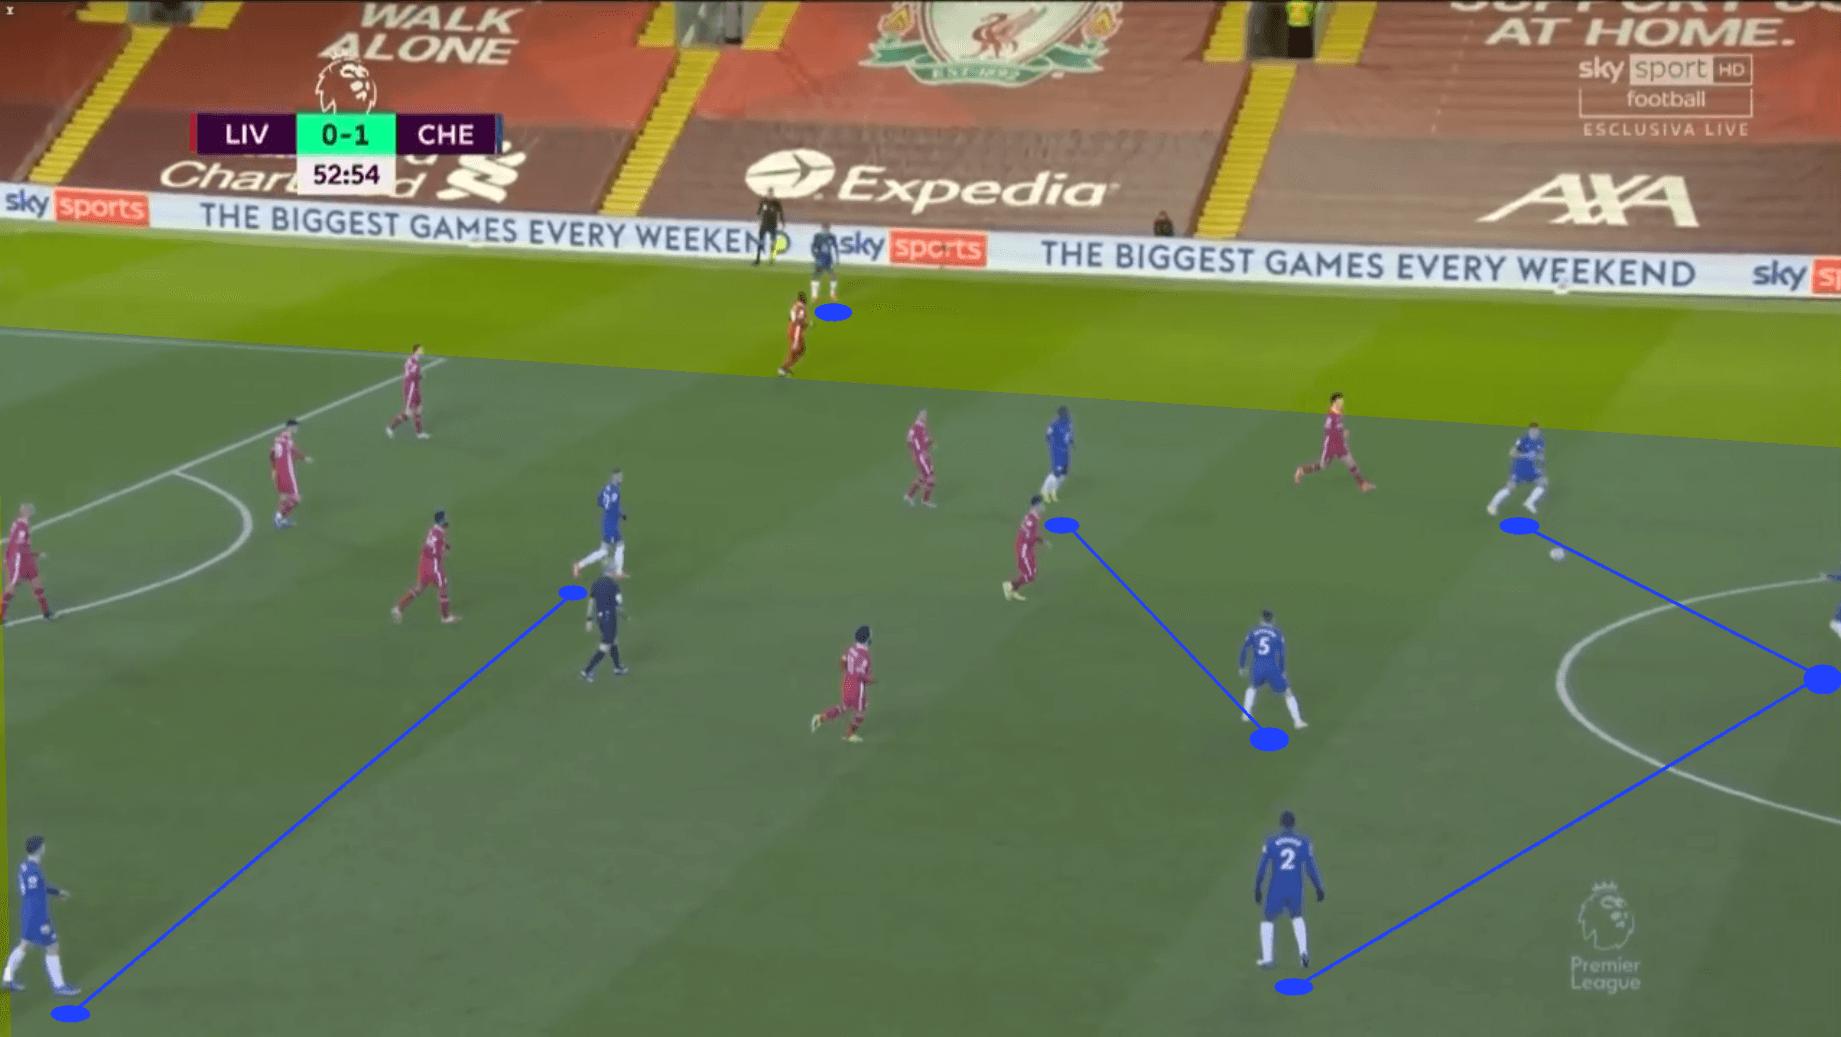 UEFA Champions League 2020/21: Real Madrid vs Chelsea – tactical preview tactics